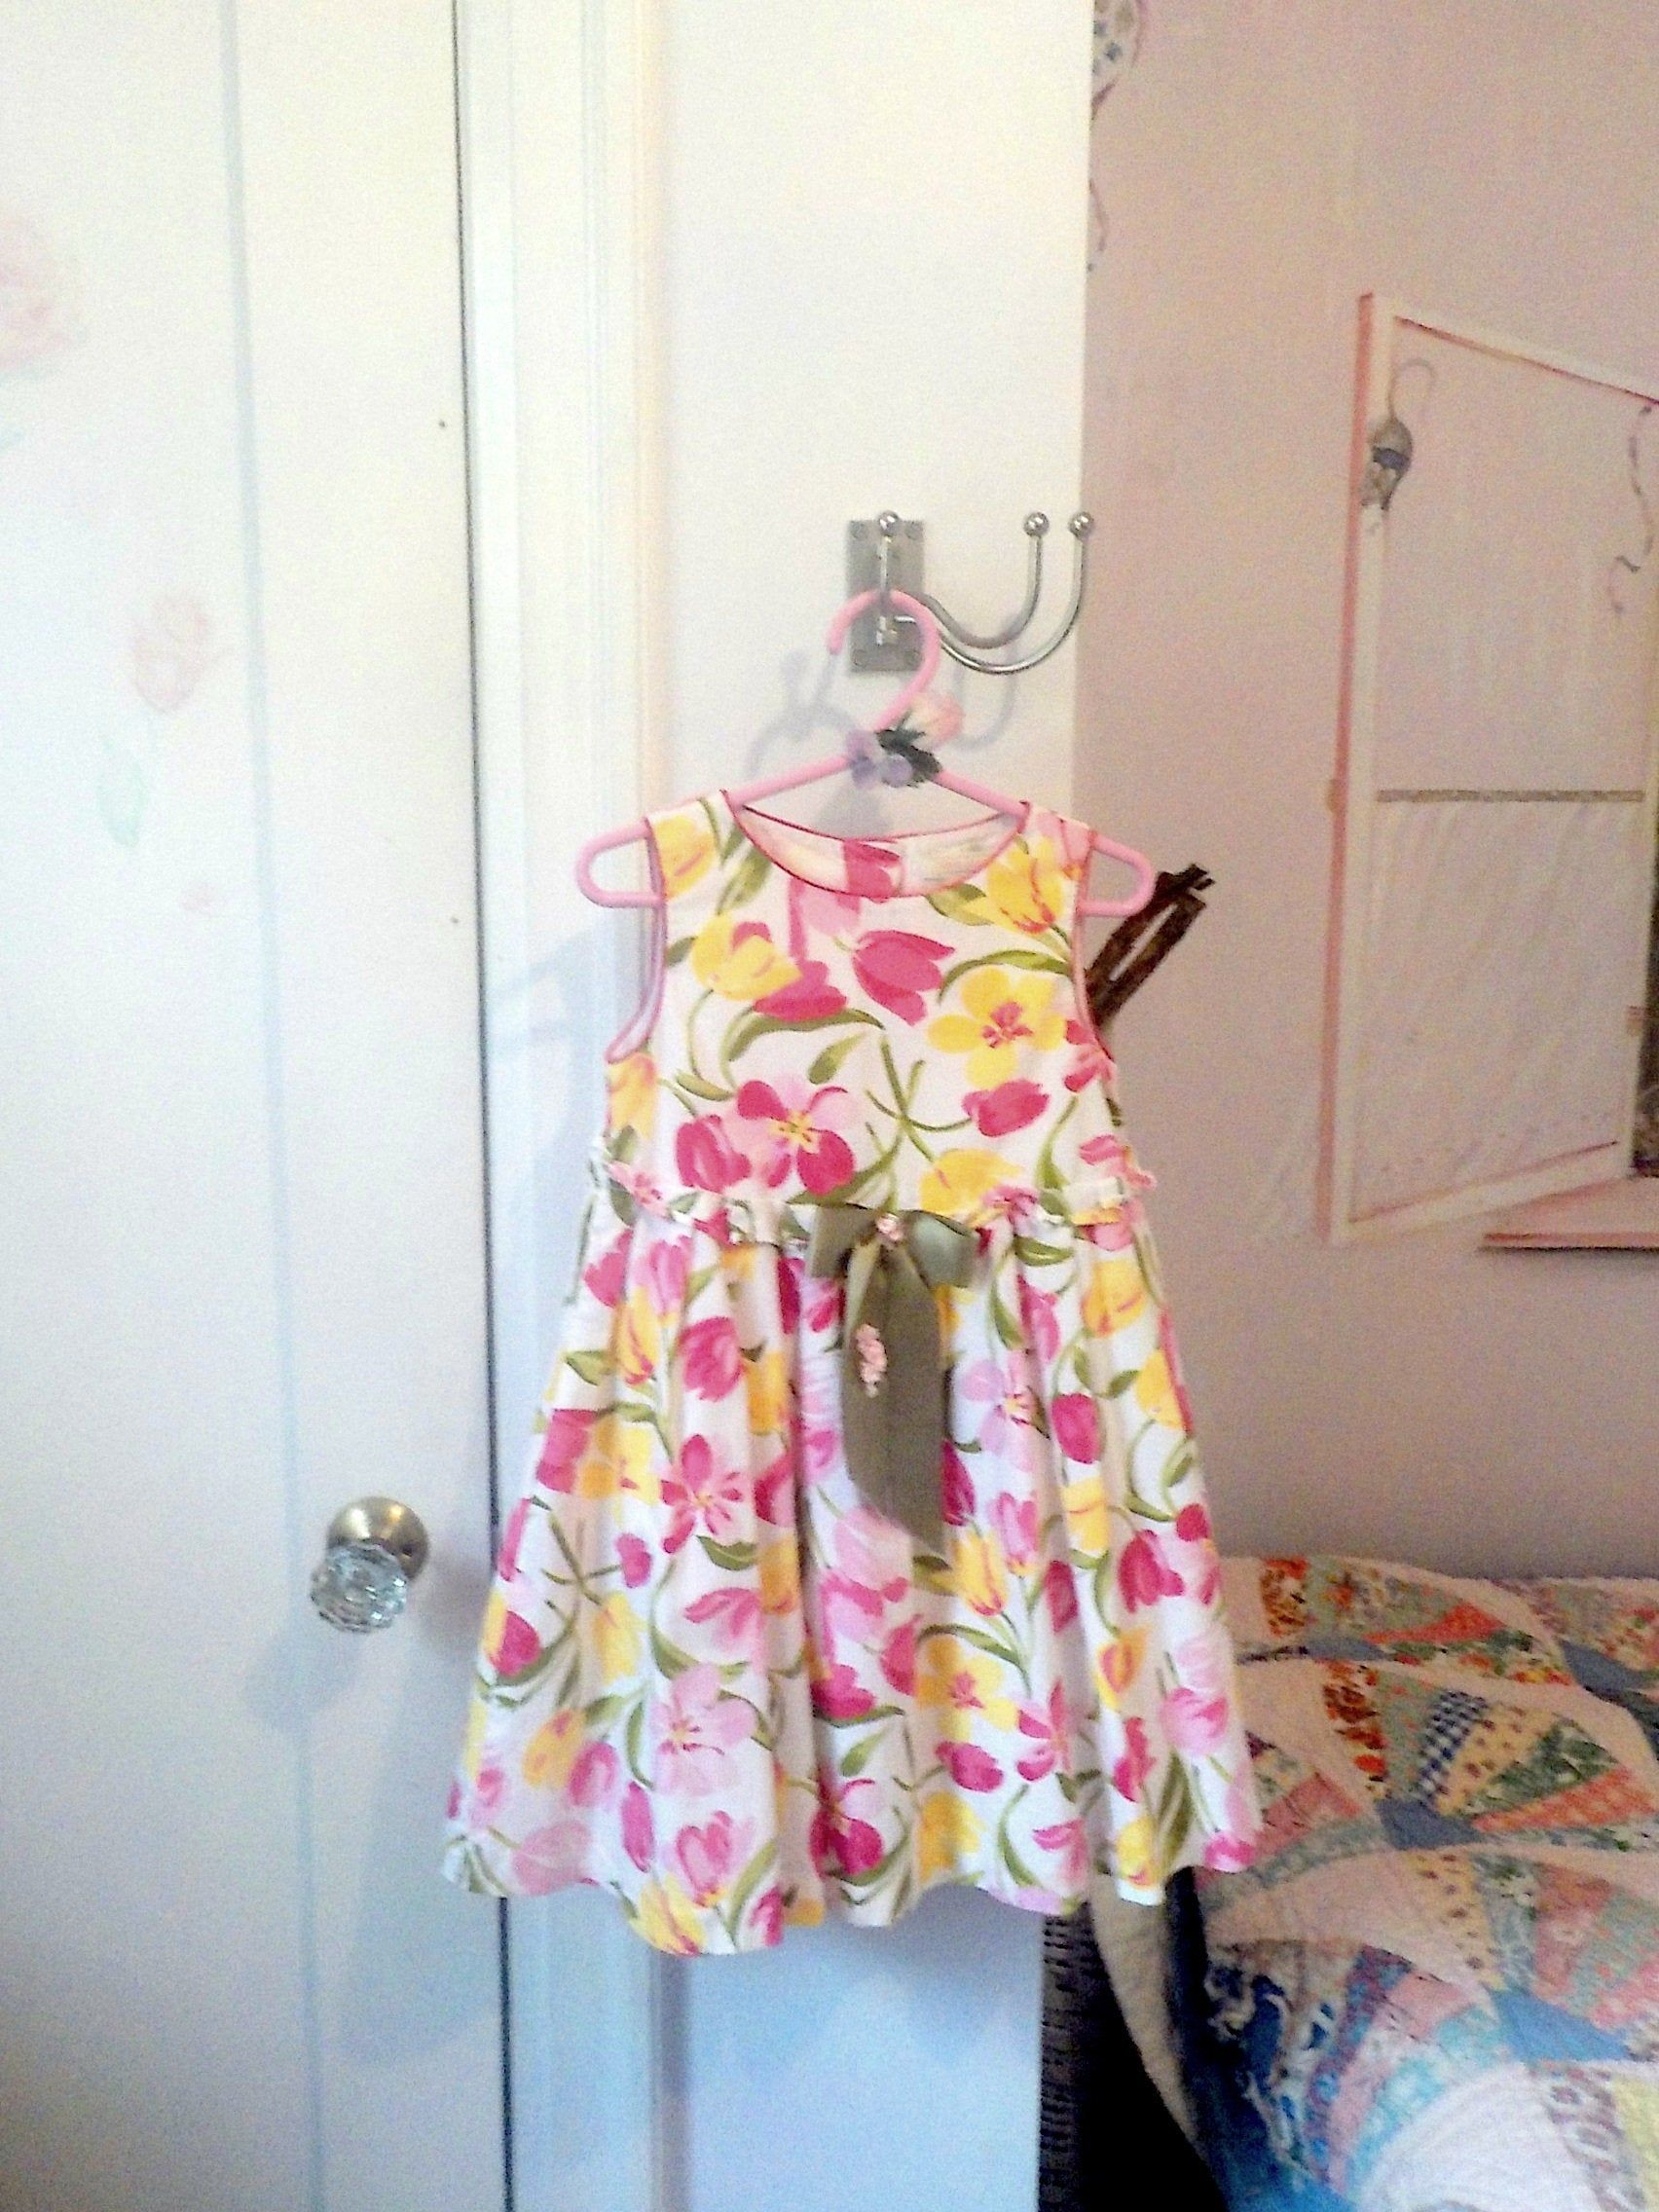 Size 4t Little Girls Fancy Dress Upscaled Little Girls Dress Etsy Birthday Party Dress Girl Outfits Little Girl Dresses [ 2272 x 1704 Pixel ]